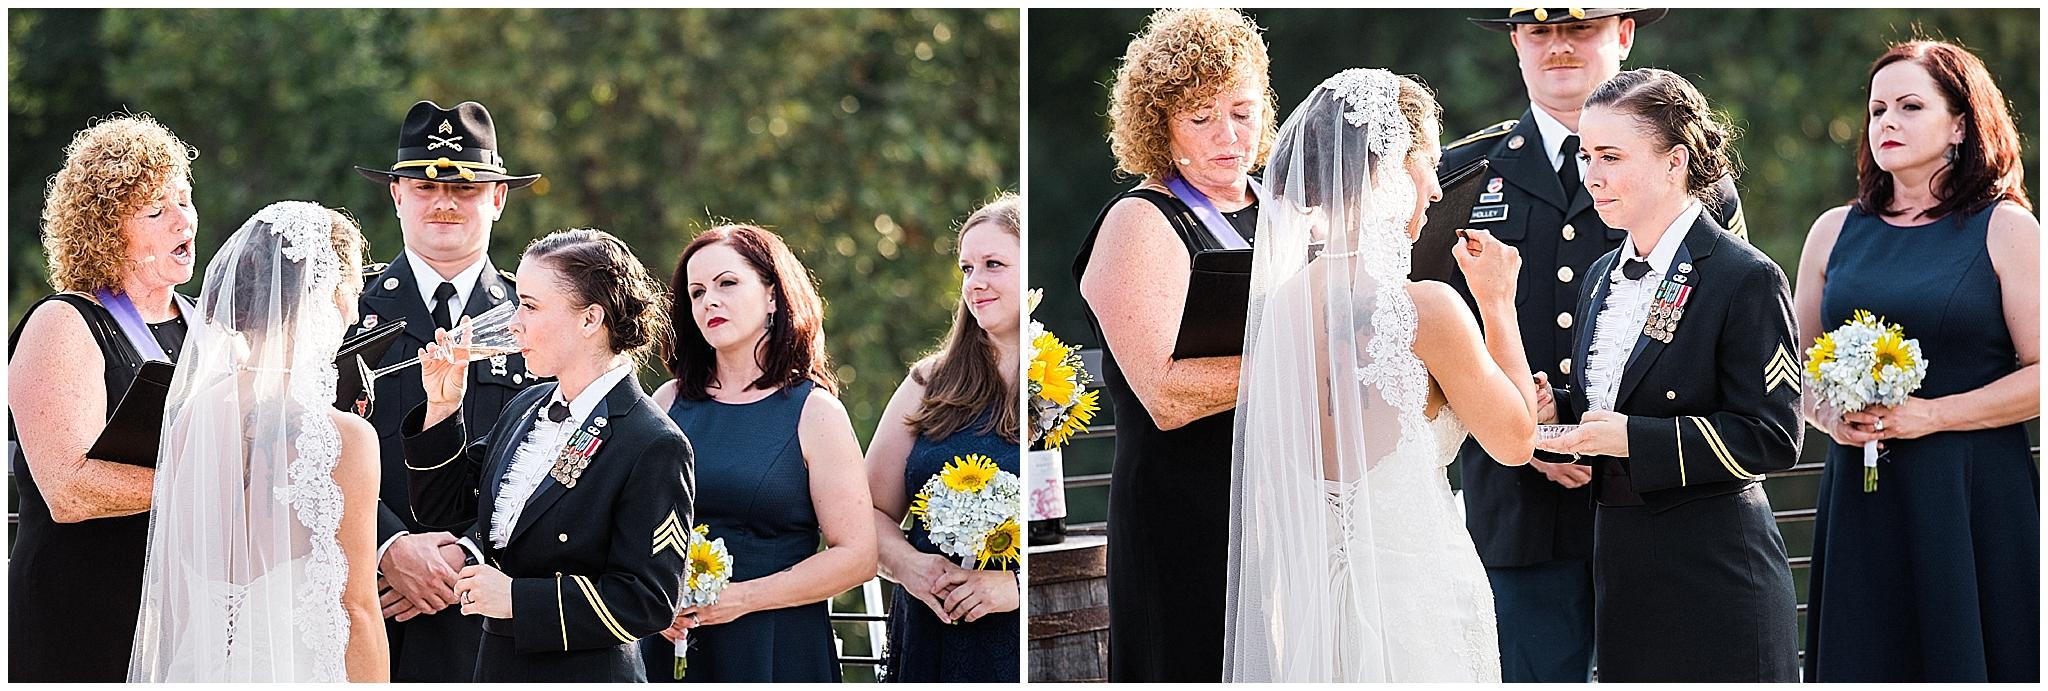 Wedding_Asheville_Highland_Brewing_Photographer_17.jpg